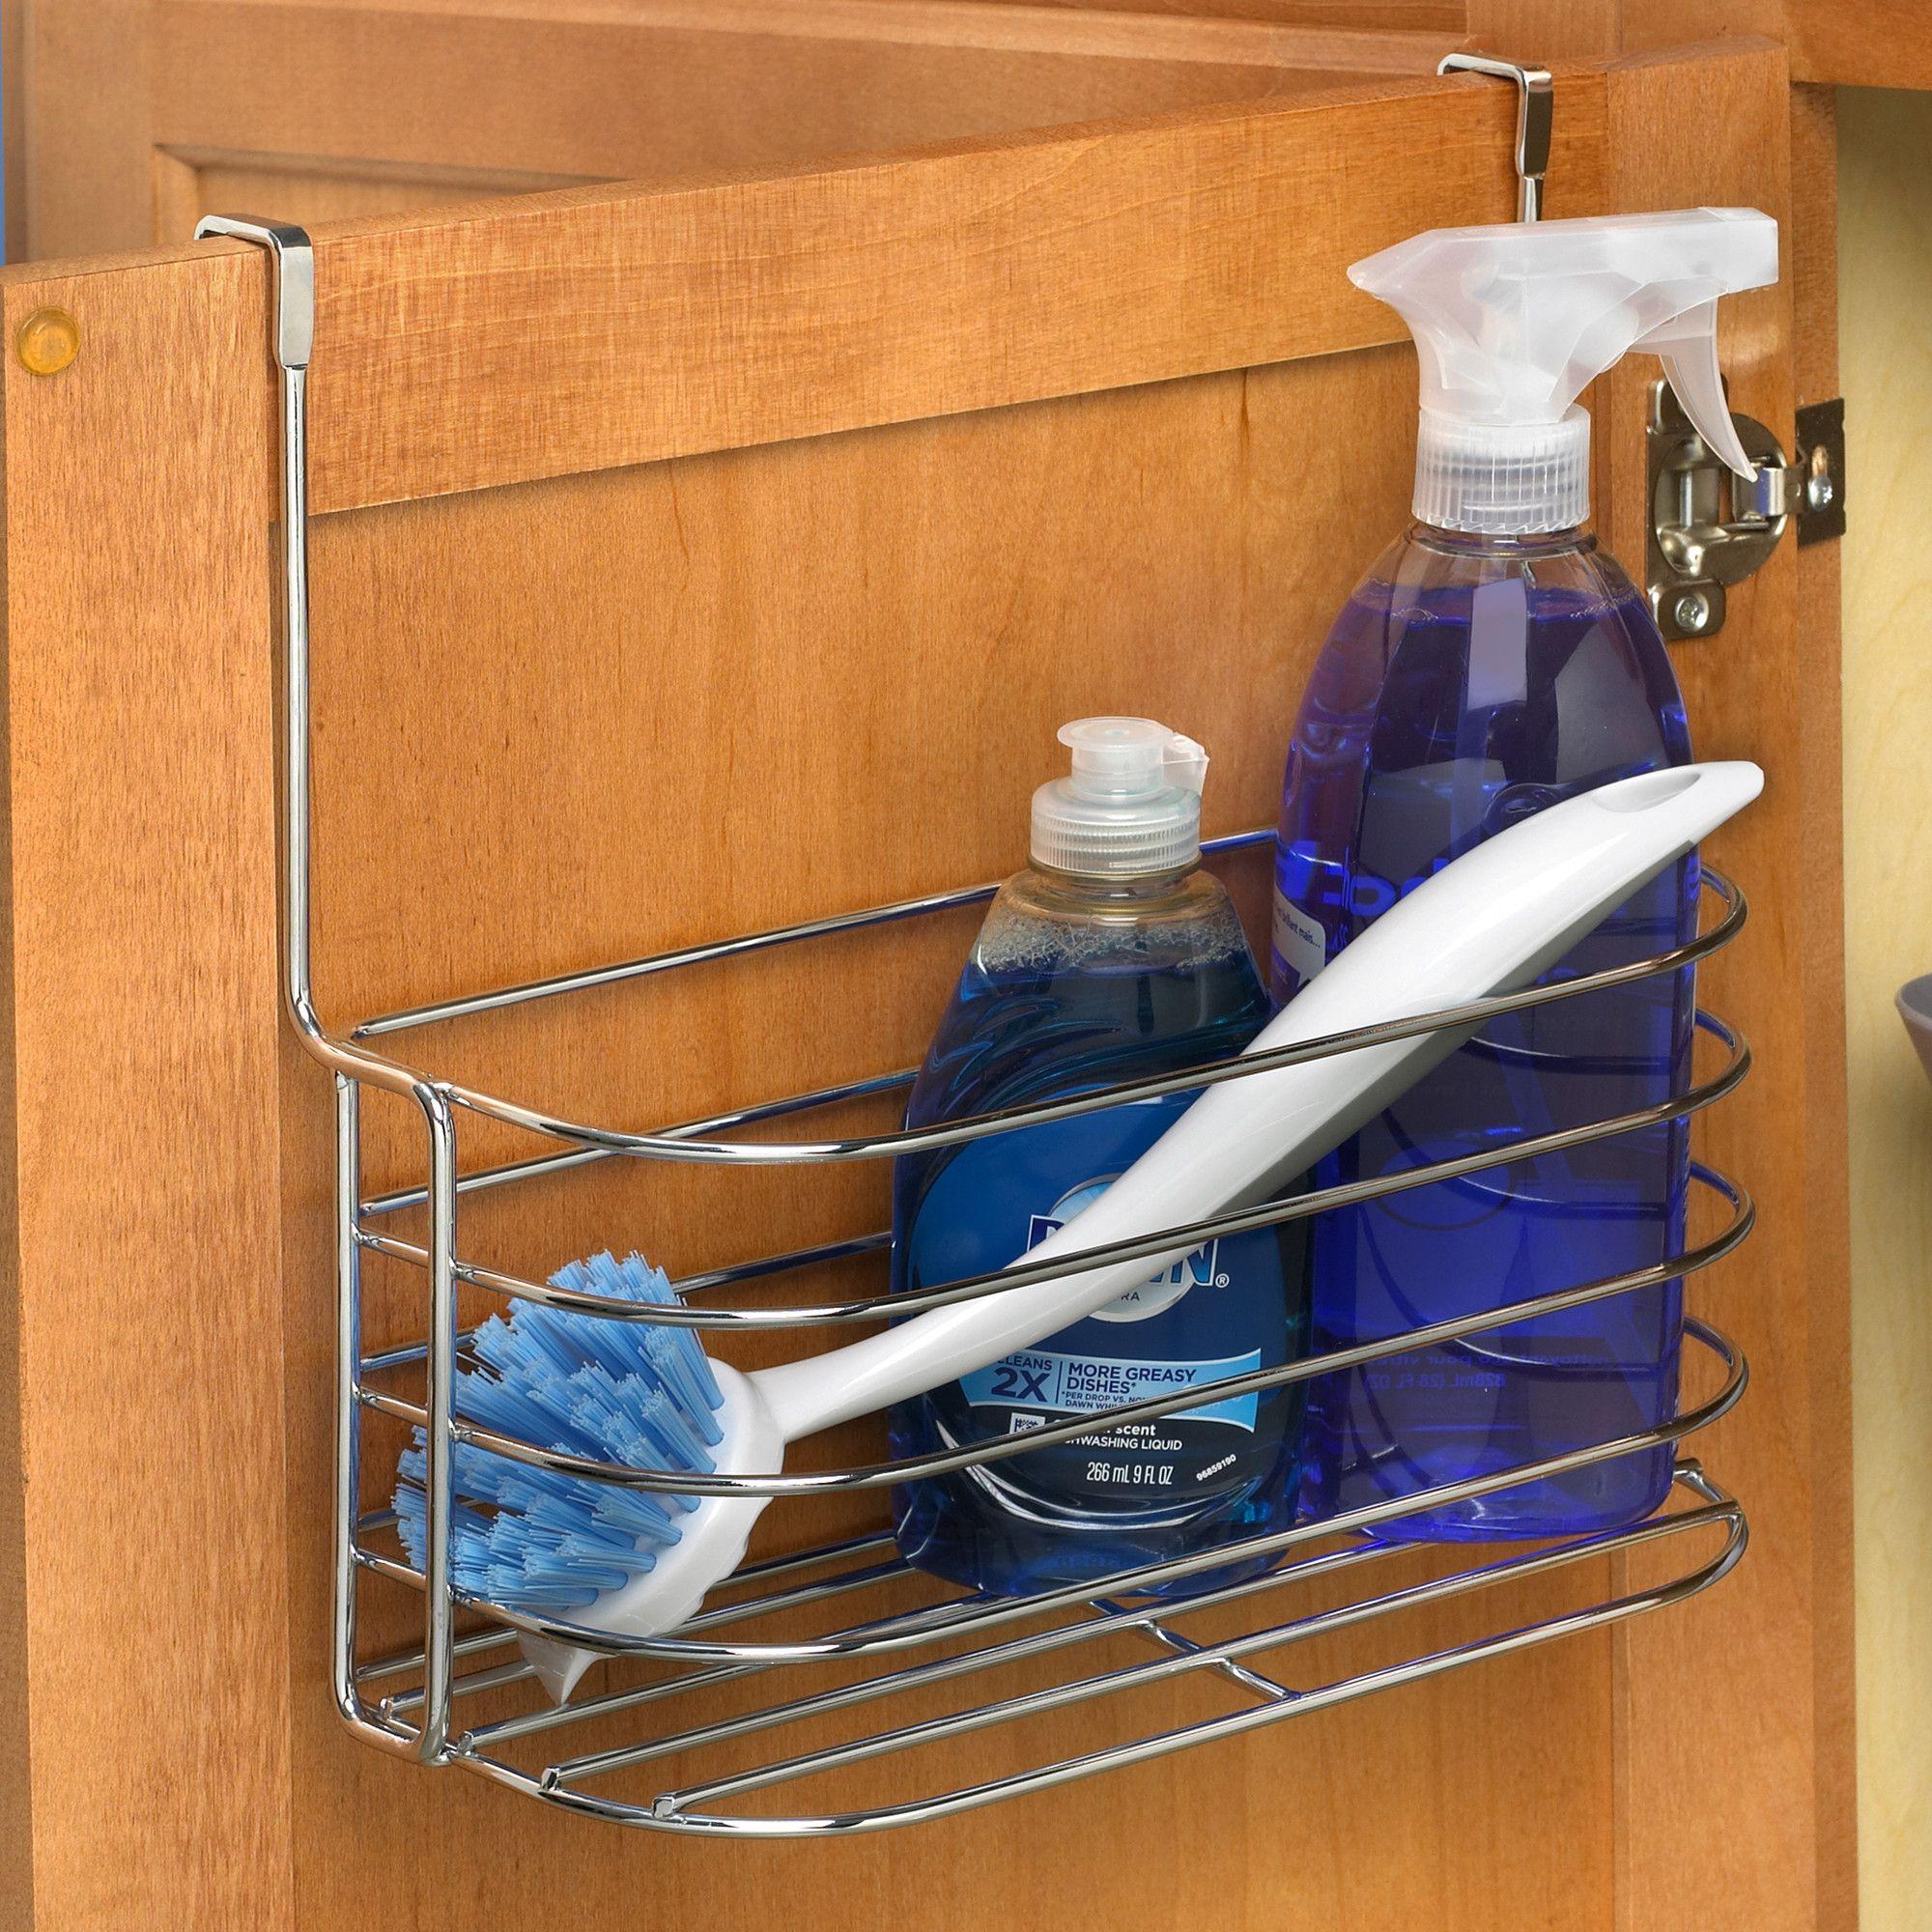 Duo Over The Cabinet Towel Bar And Basket Door Organizer Towel Bar